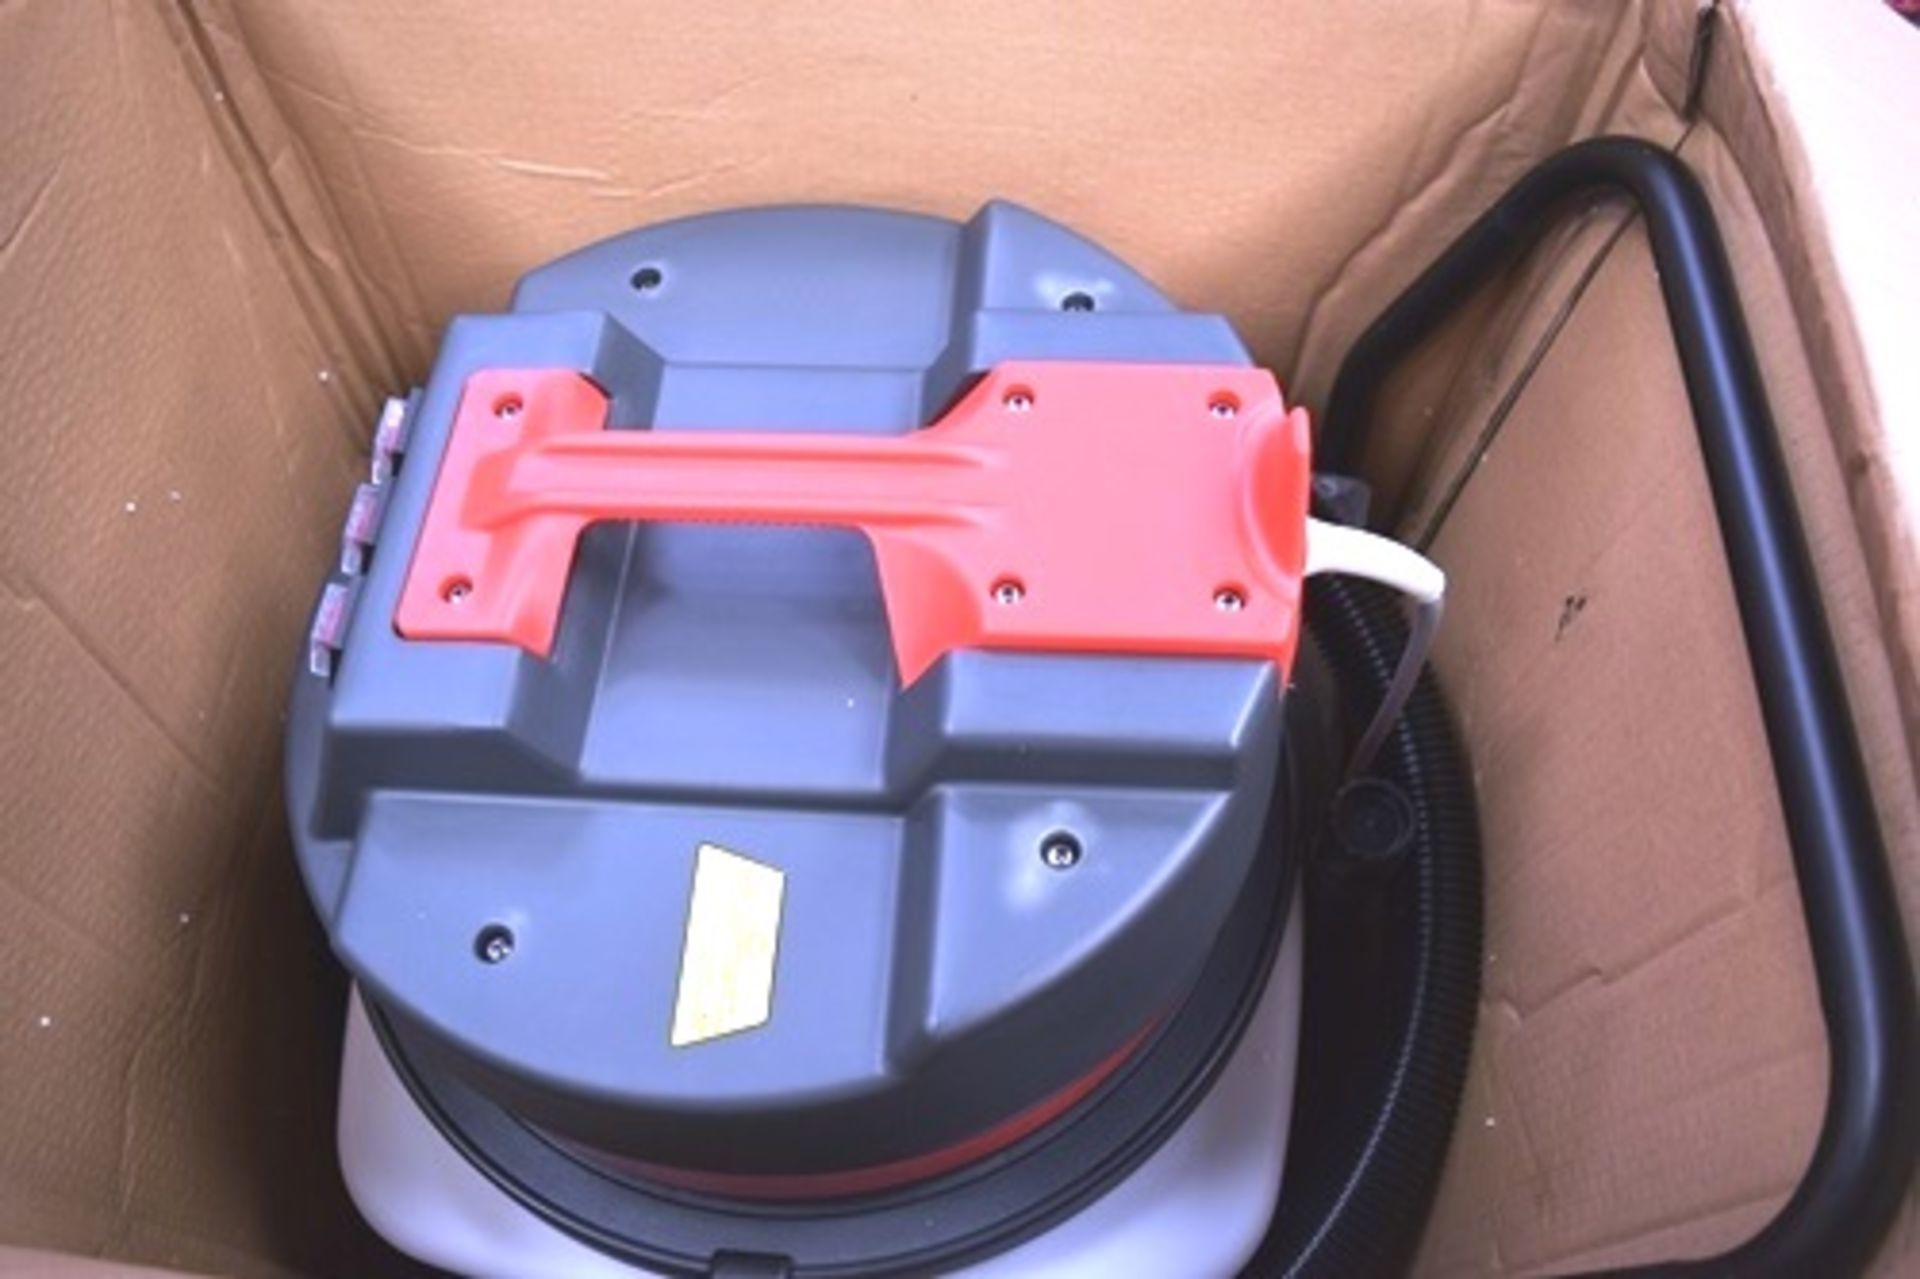 1 x Max Blast wet & dry 90ltr industrial vacuum, SKU: 25579 - New in box, box slightly tatty ( - Image 3 of 4